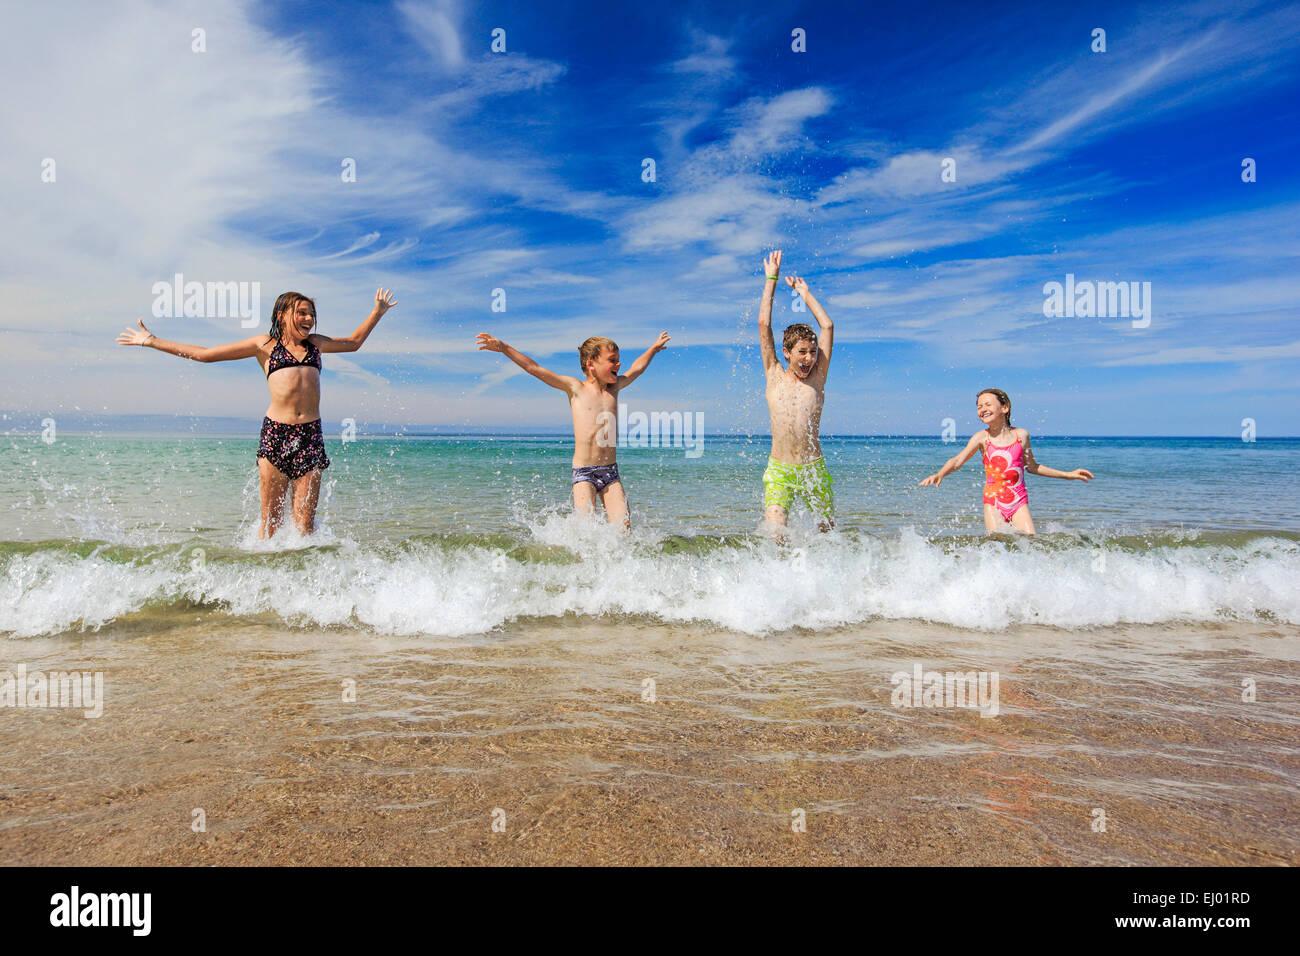 4, activity, swimming trunks, swim suit, joy, sky, hands, youngsters, boy, children, boy, coast, sea, girl, fun, - Stock Image